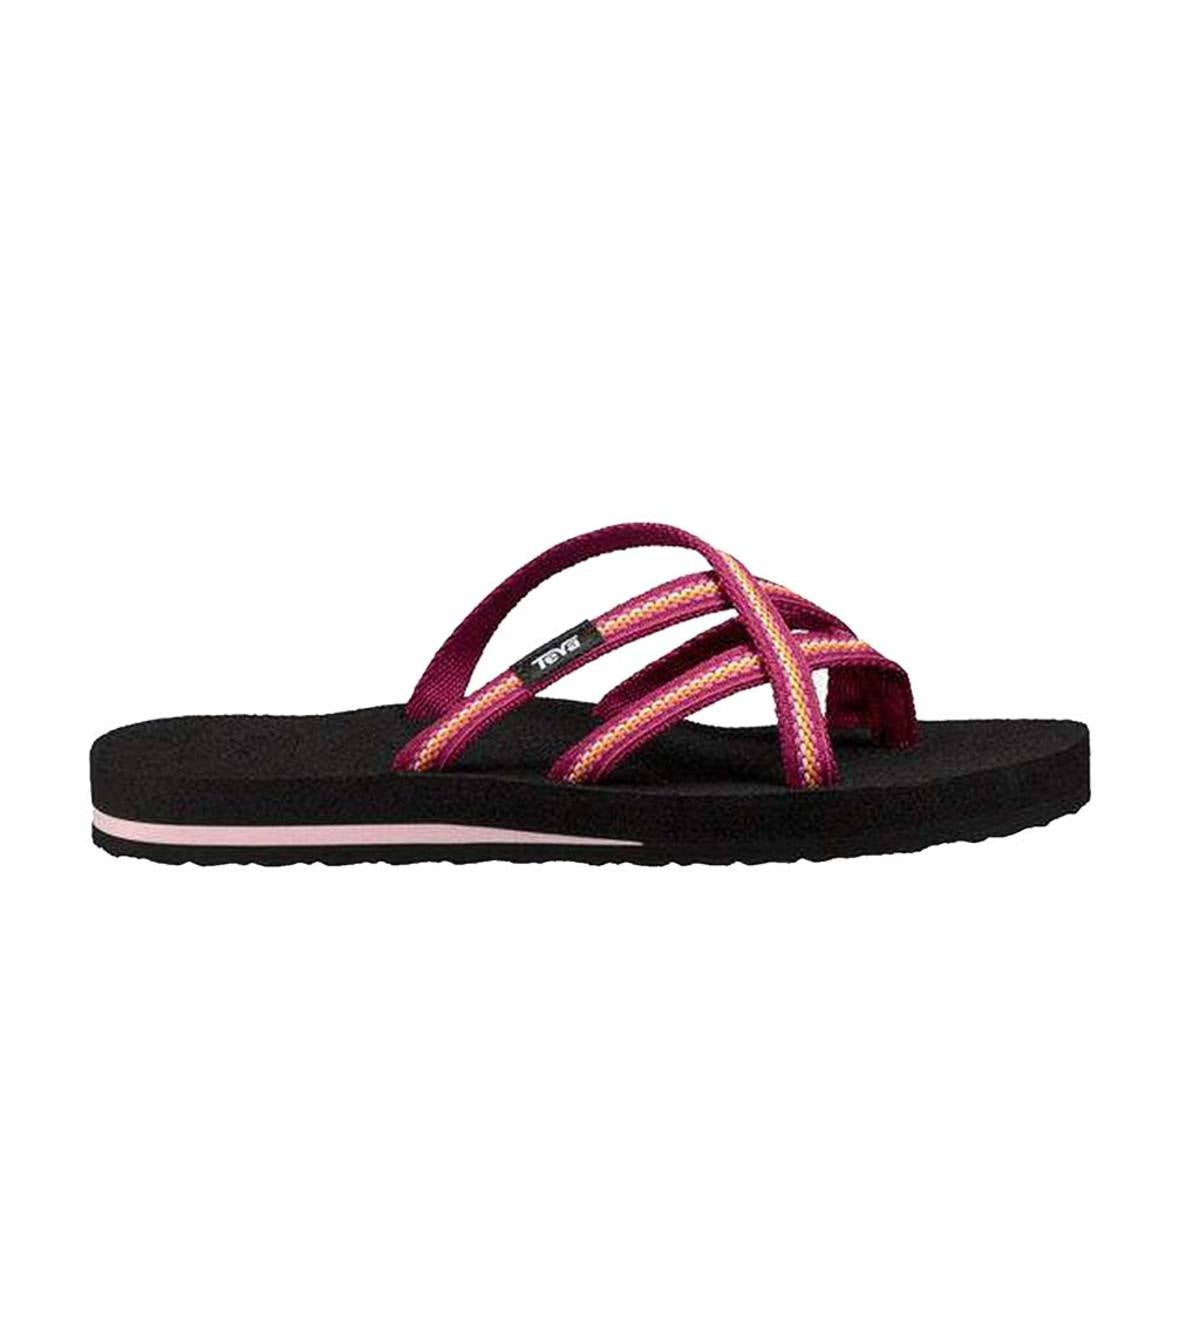 def39ae81193d7 Teva Women s Mush Olowahu Flip Flops - Boysenberry - Size 6